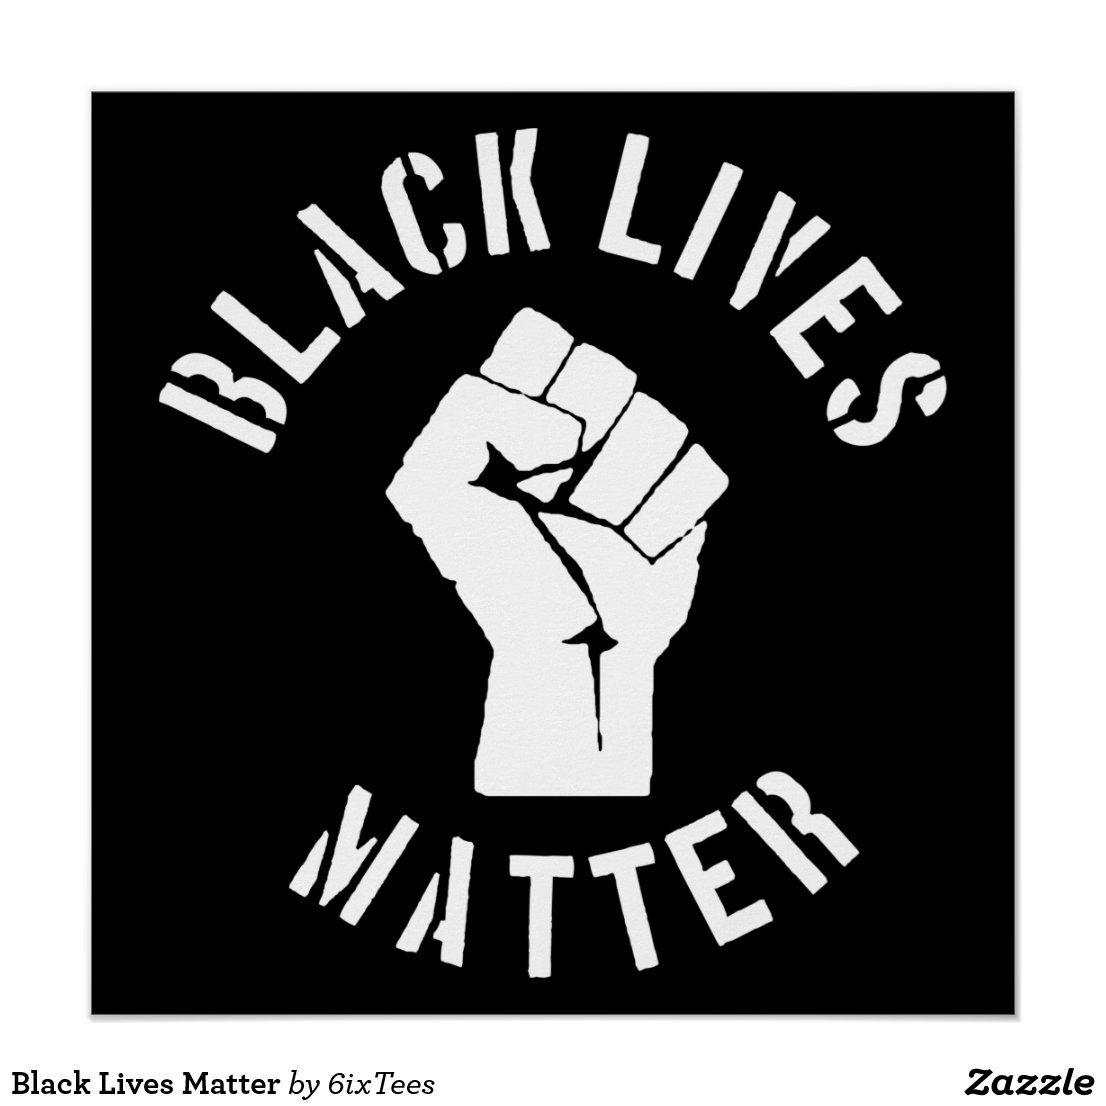 Black Lives Matter Poster Zazzle Com Black Lives Matter Poster Black Lives Matter Art Black Lives Matter Quotes